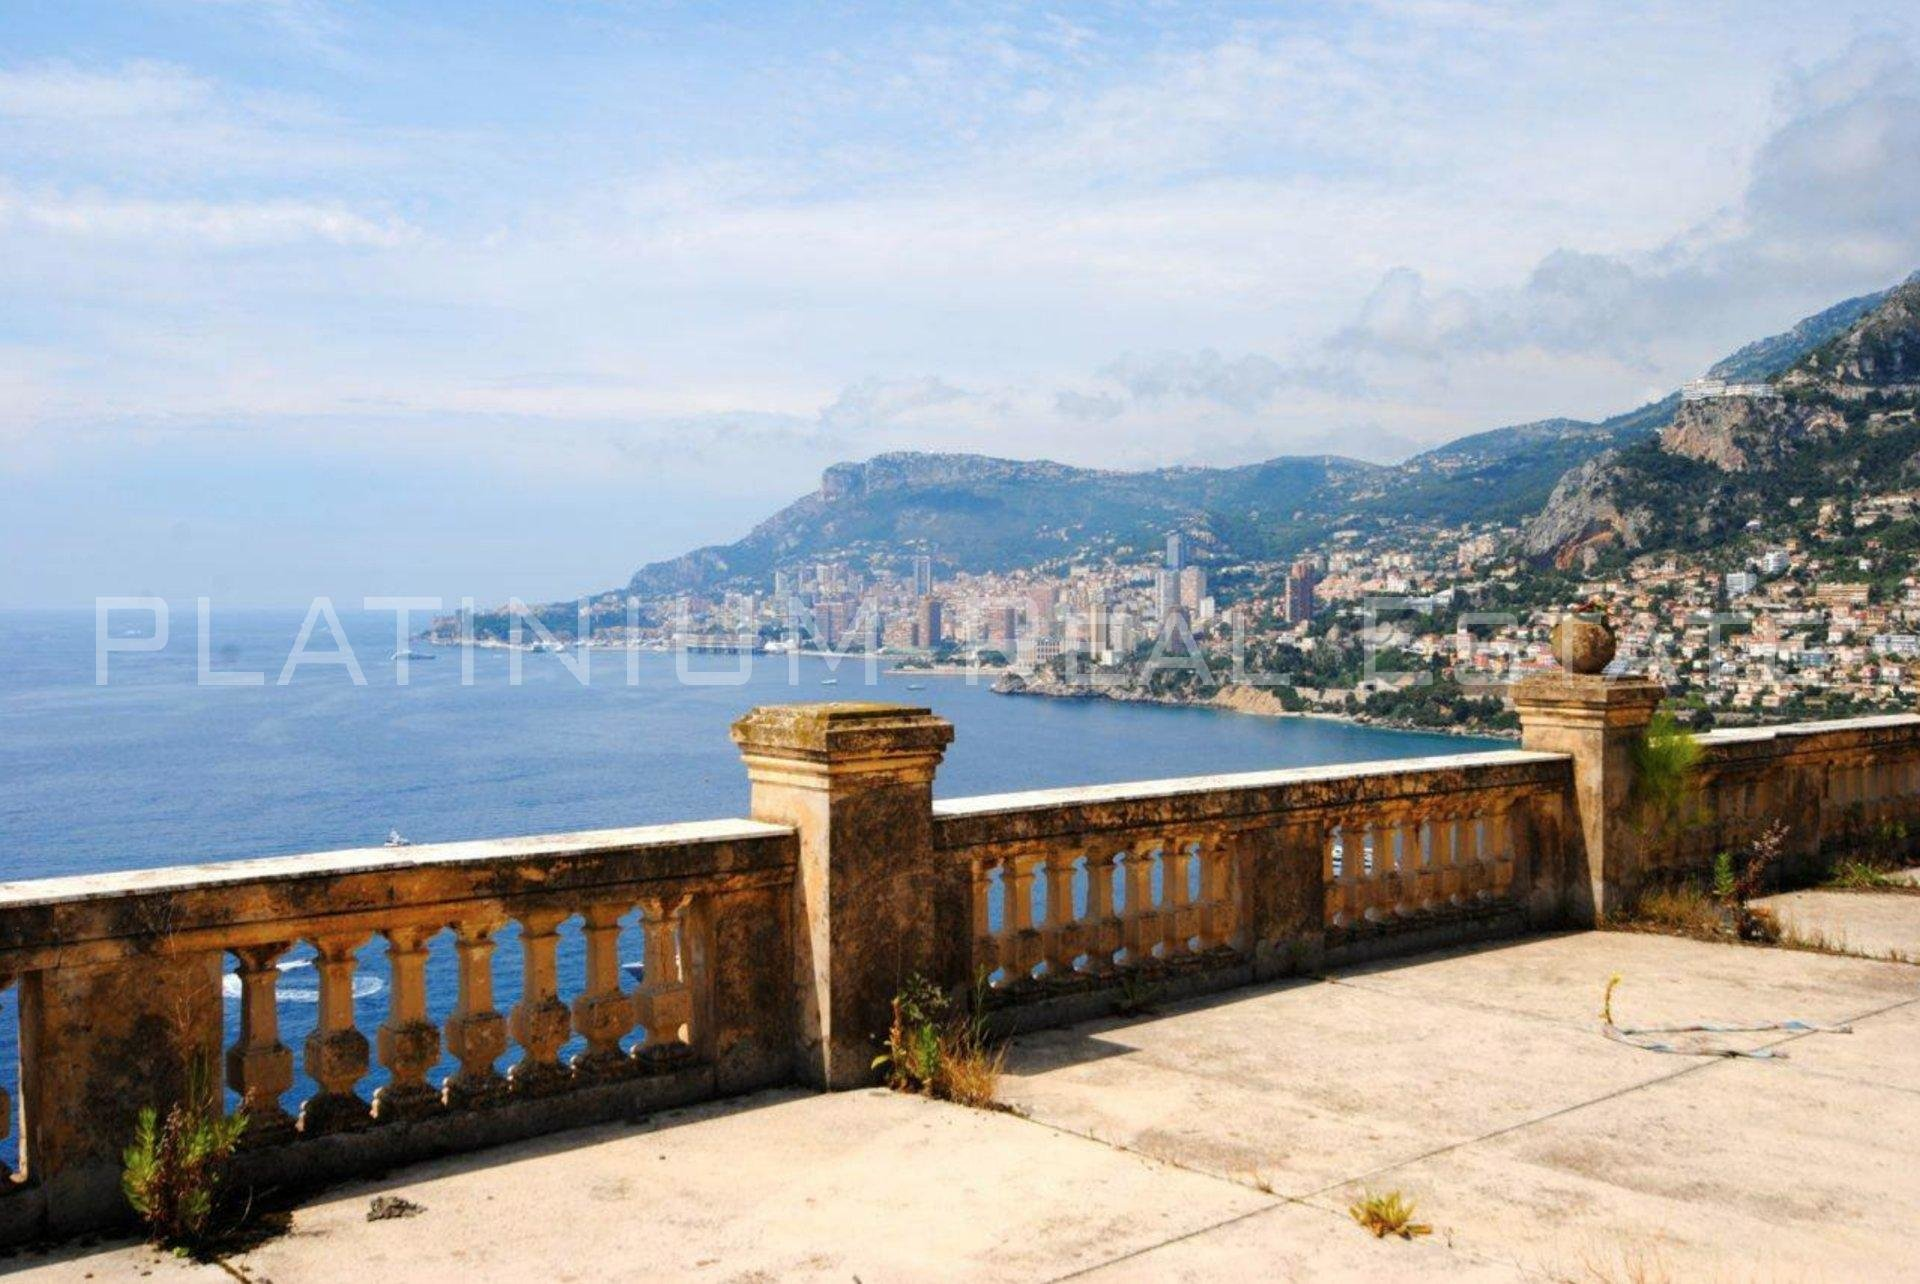 ROQUEBRUNE-CAP-MARTIN Villa 1300m2 Panoramic sea view 7 bedrooms TO RENOVATE